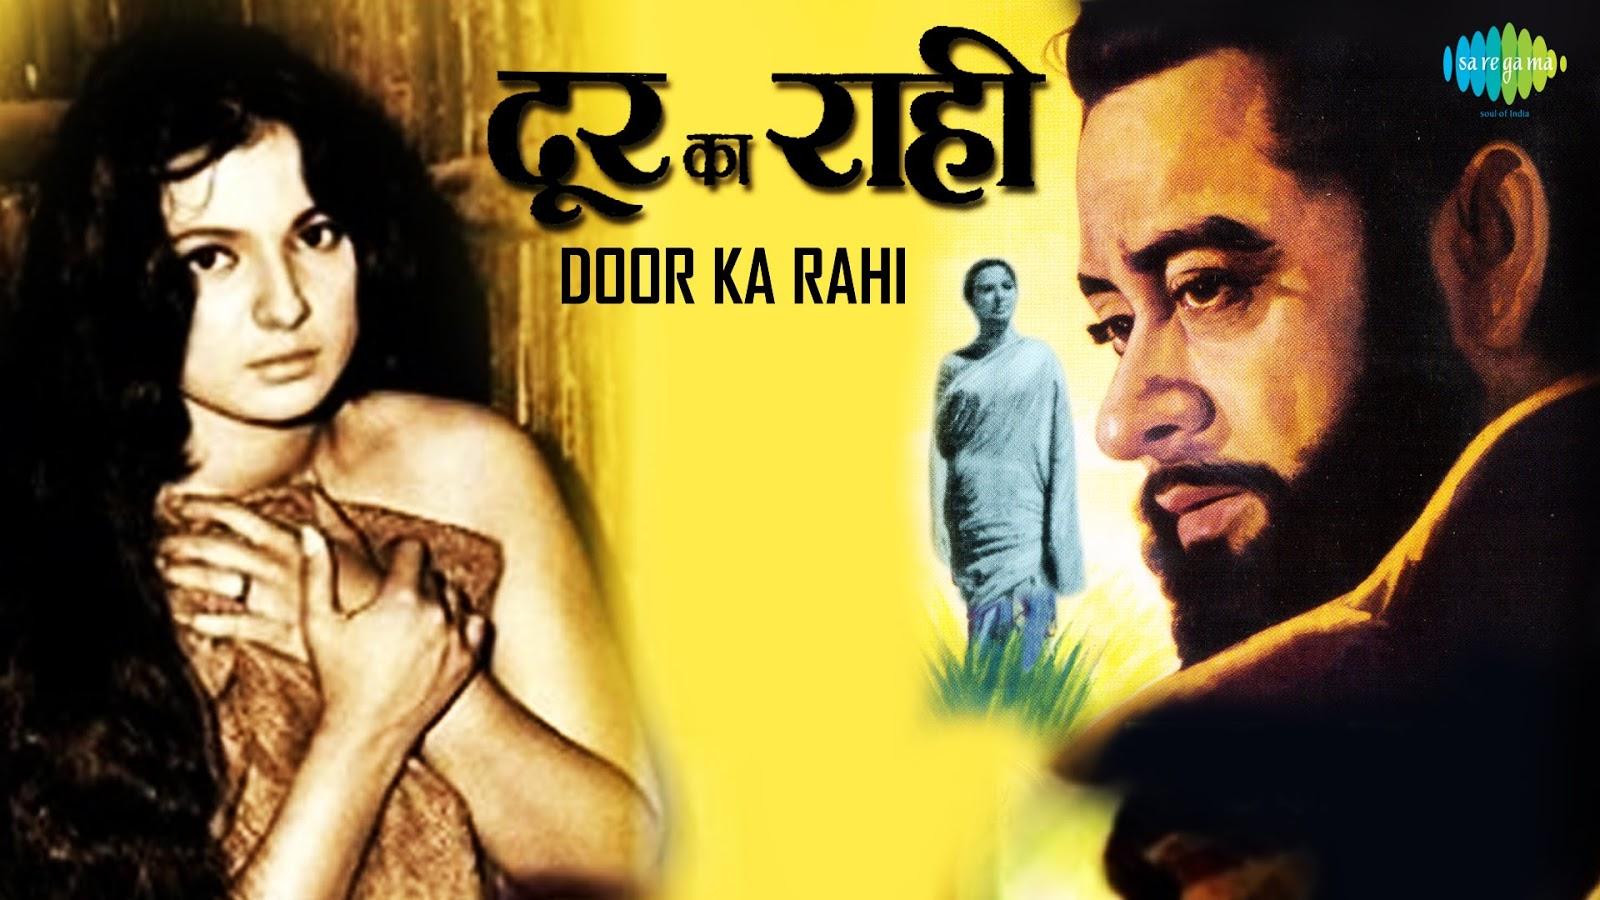 Ashok film songs lyrics - Joe venice film festival review